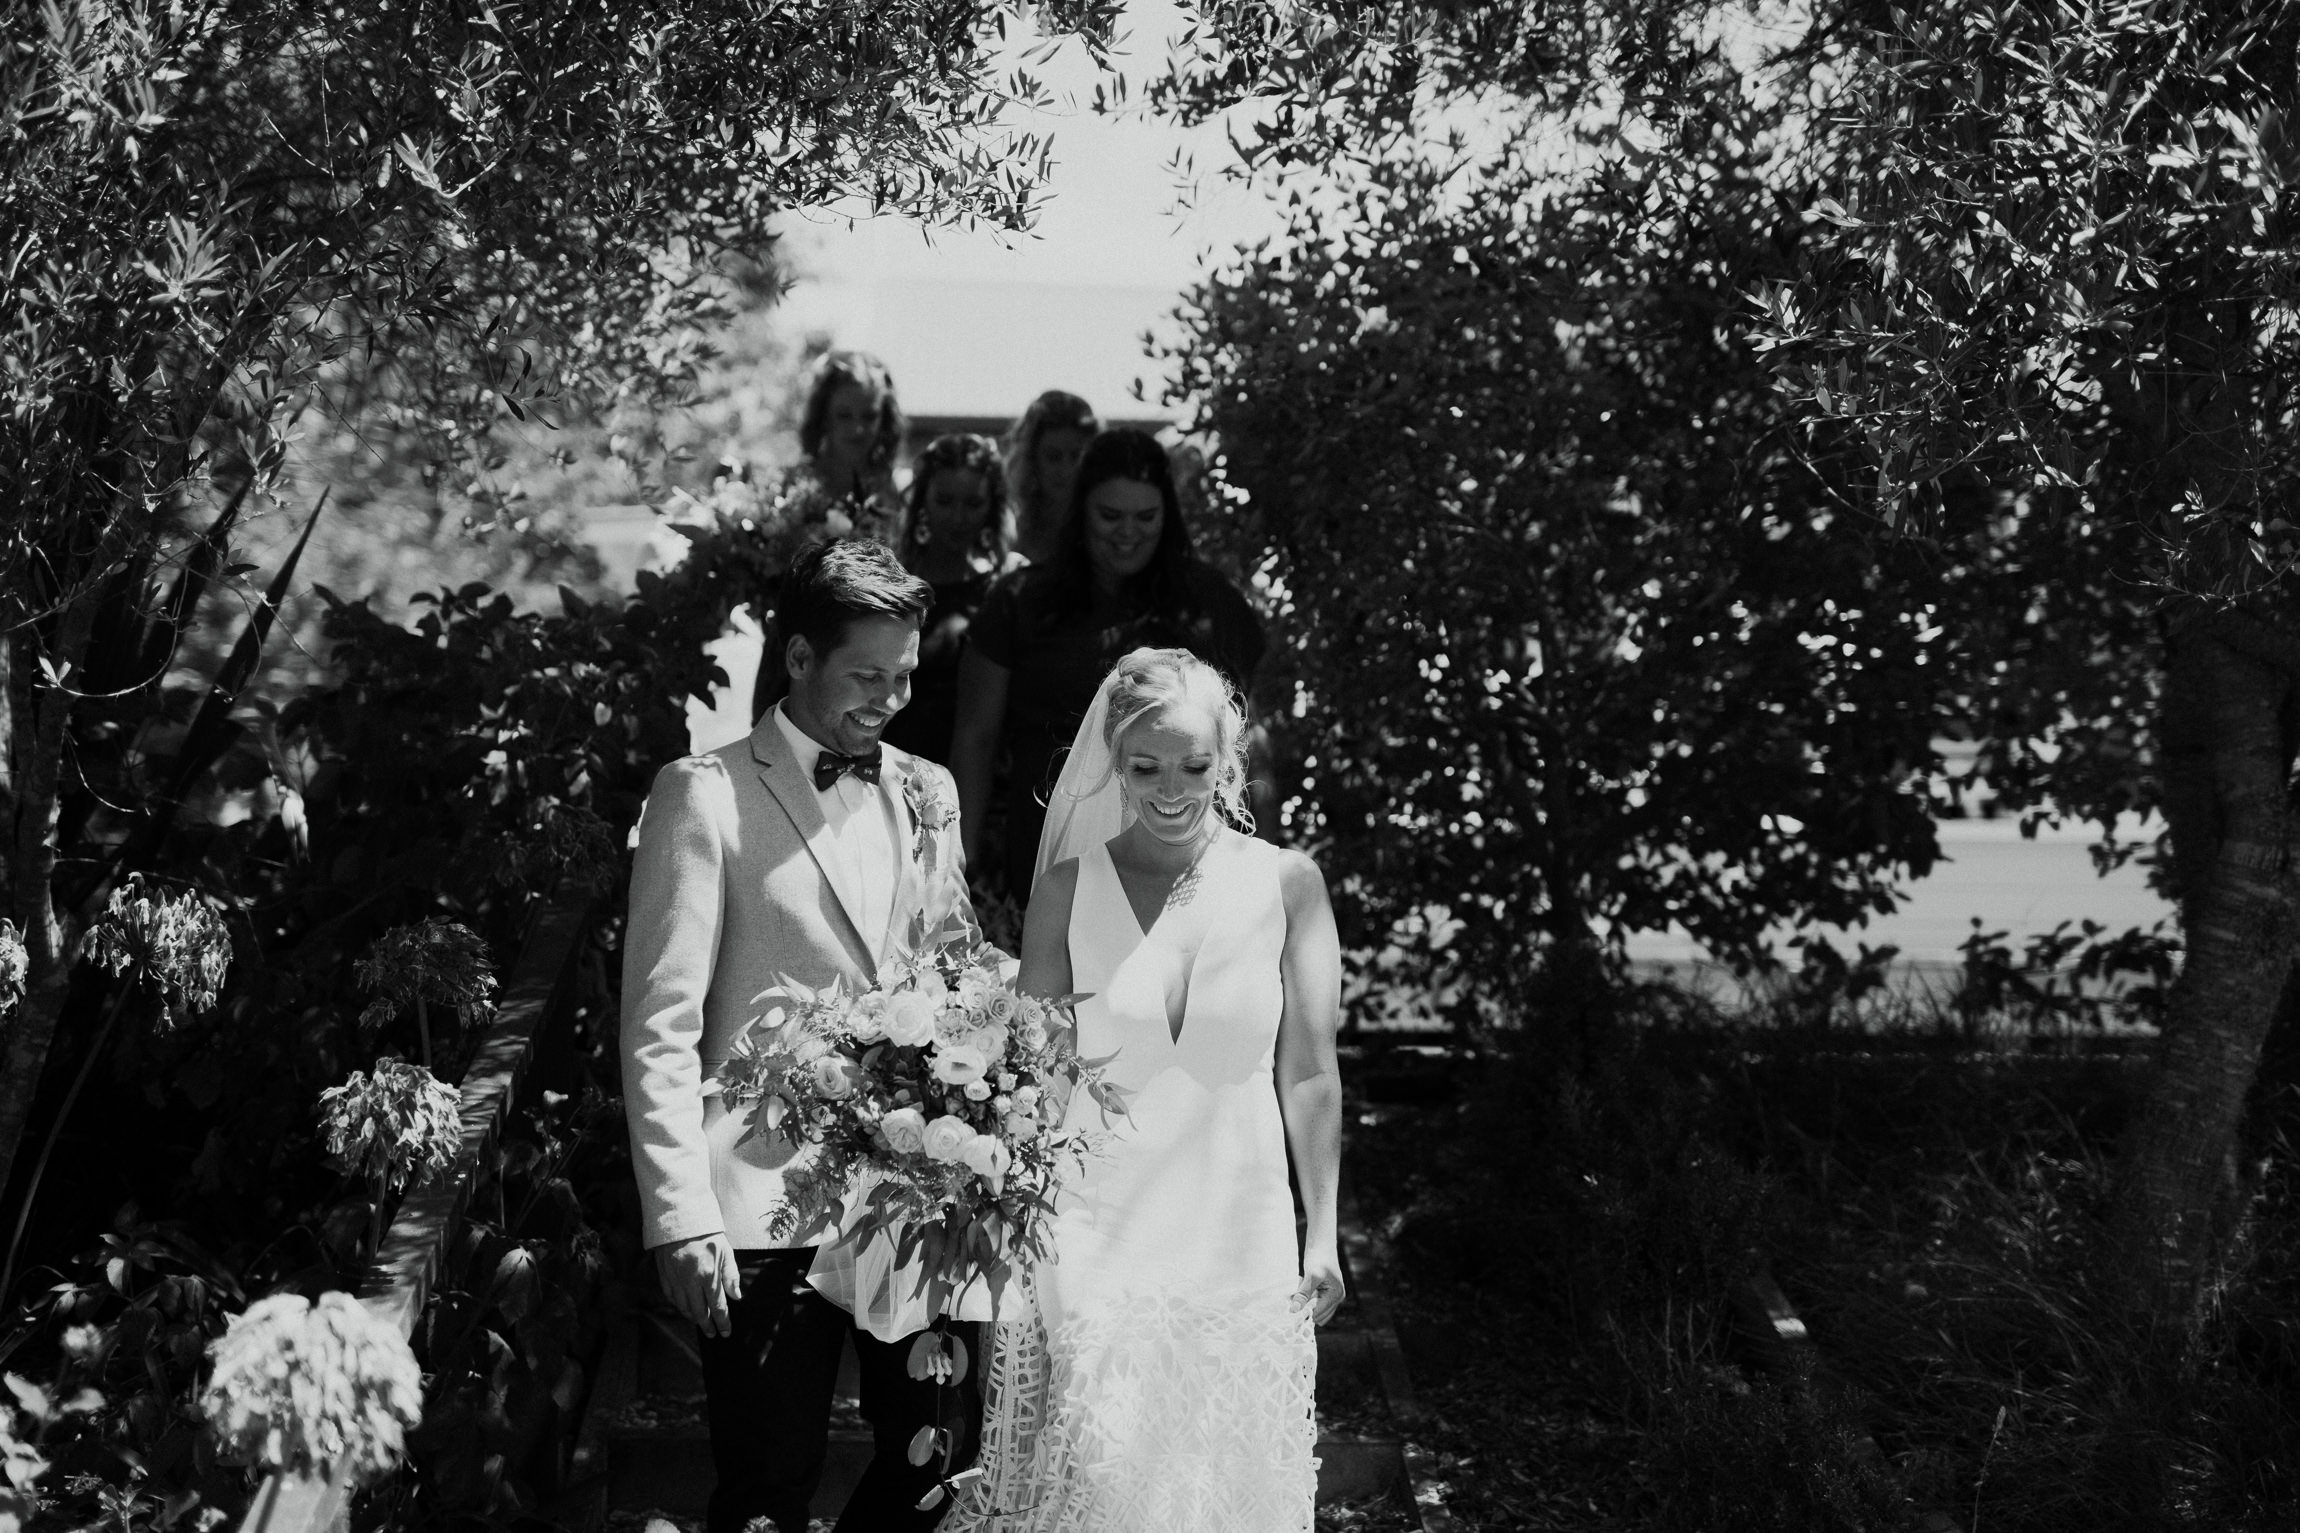 oldforestschool-wedding-blog-72.jpg